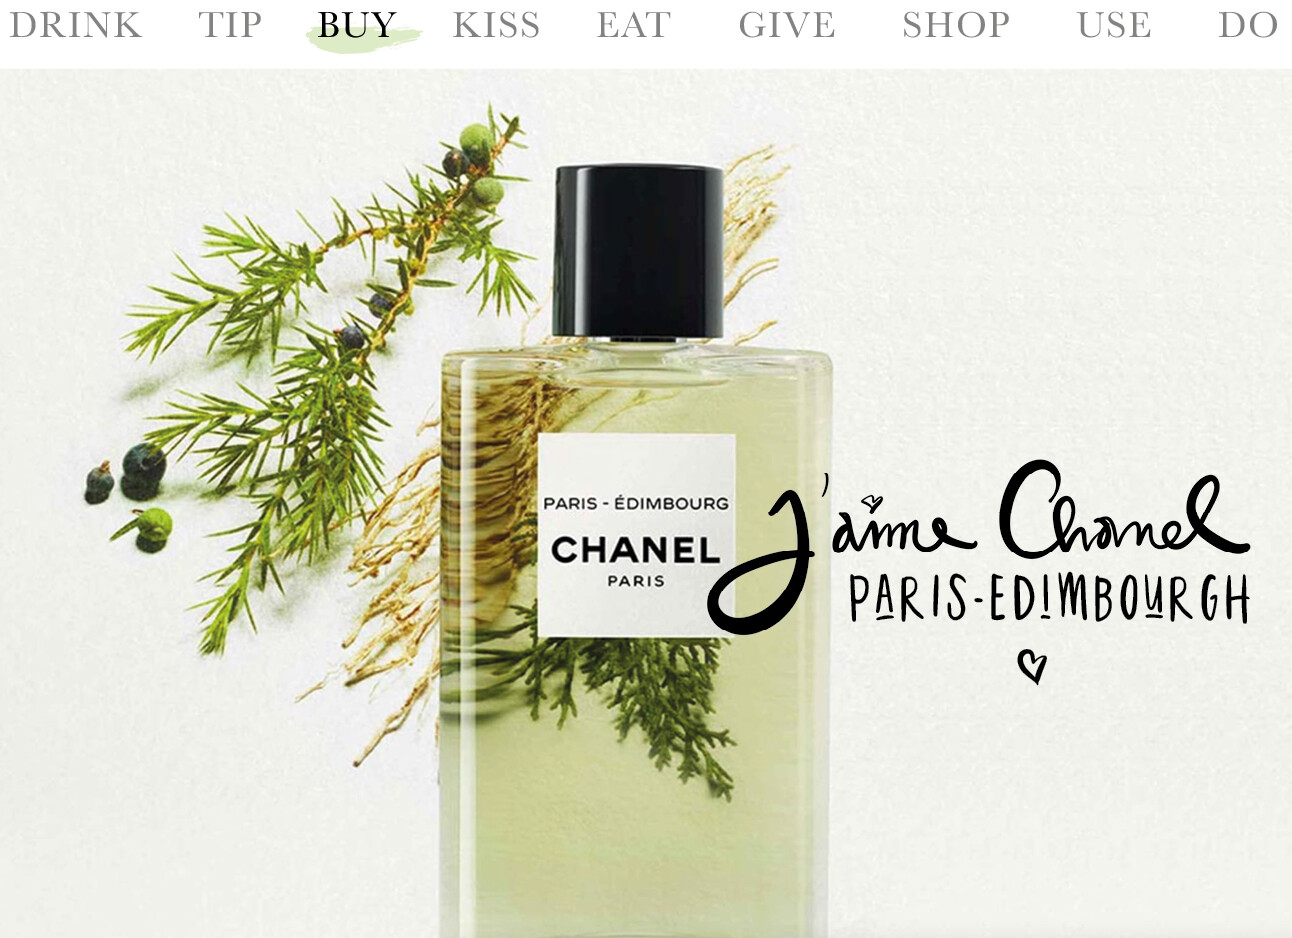 Today we.. Buy Paris-Edimbourgh CHANEL